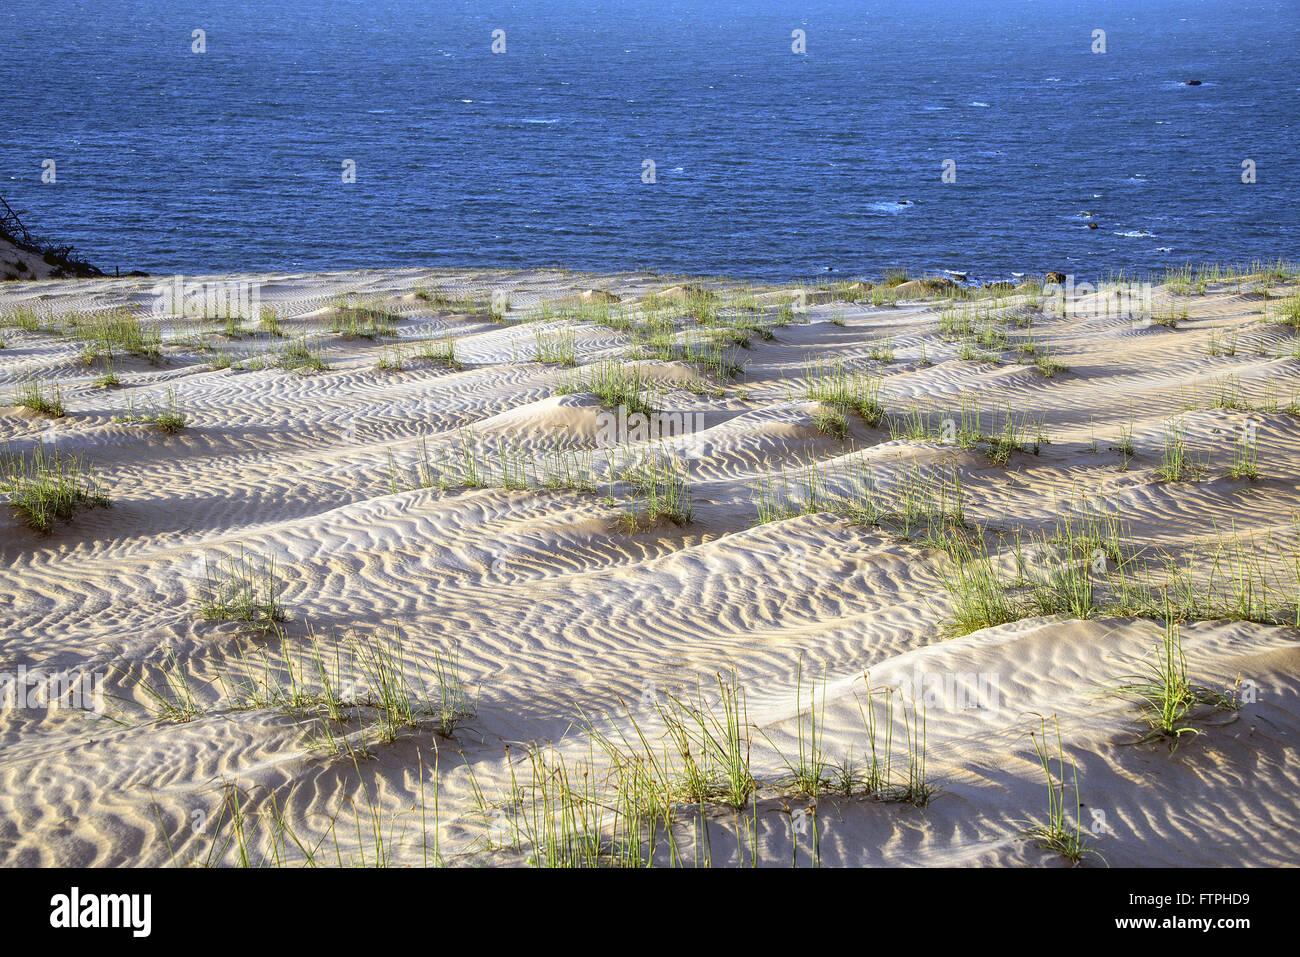 Coastal vegetation in the dunes - APA Ponta Grossa - Stock Image